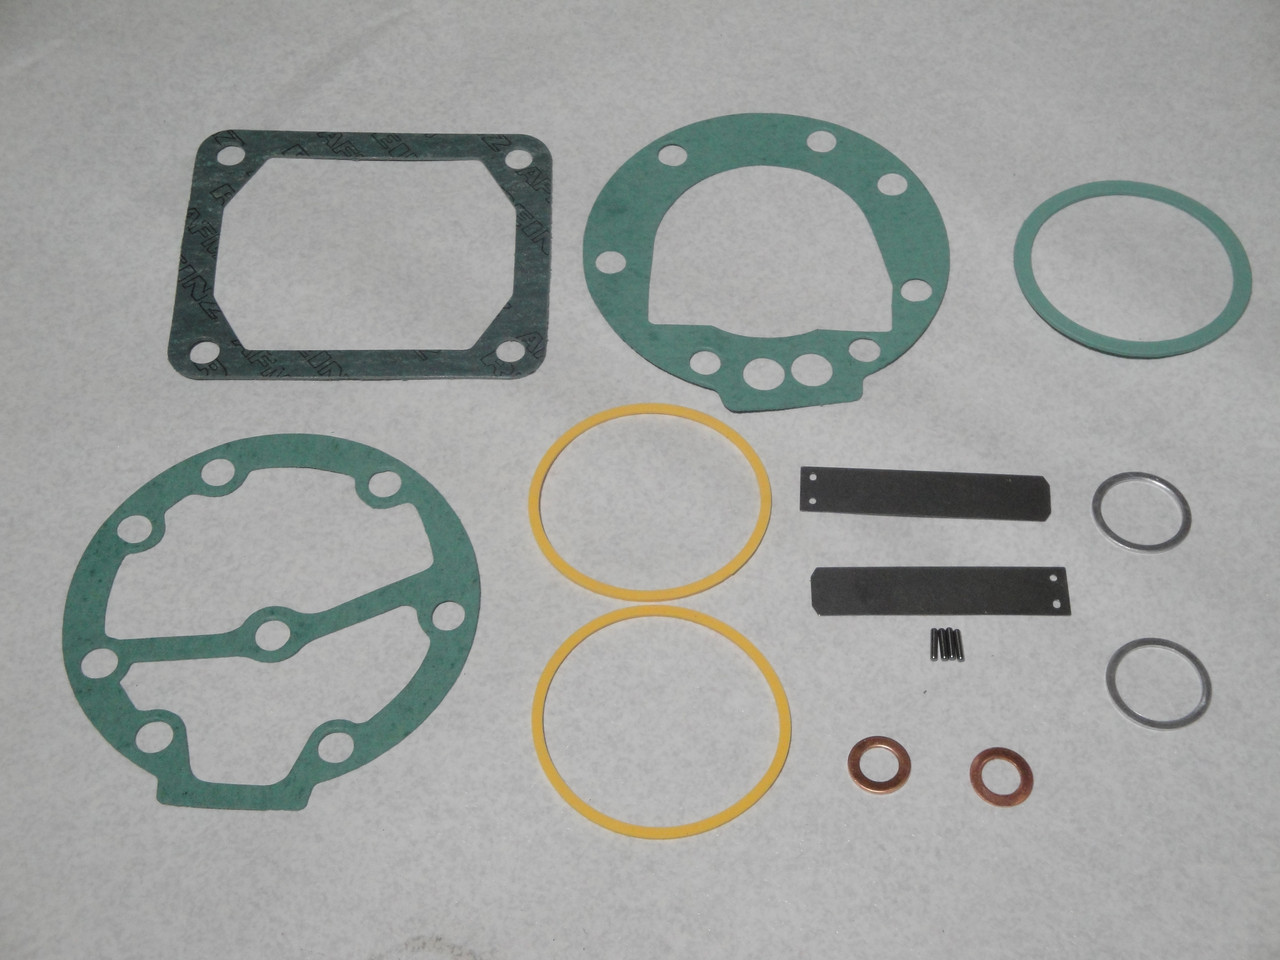 РМК компресора прокладки з клапанами БОГДАН A091-A092 (MO076.170) MAPO